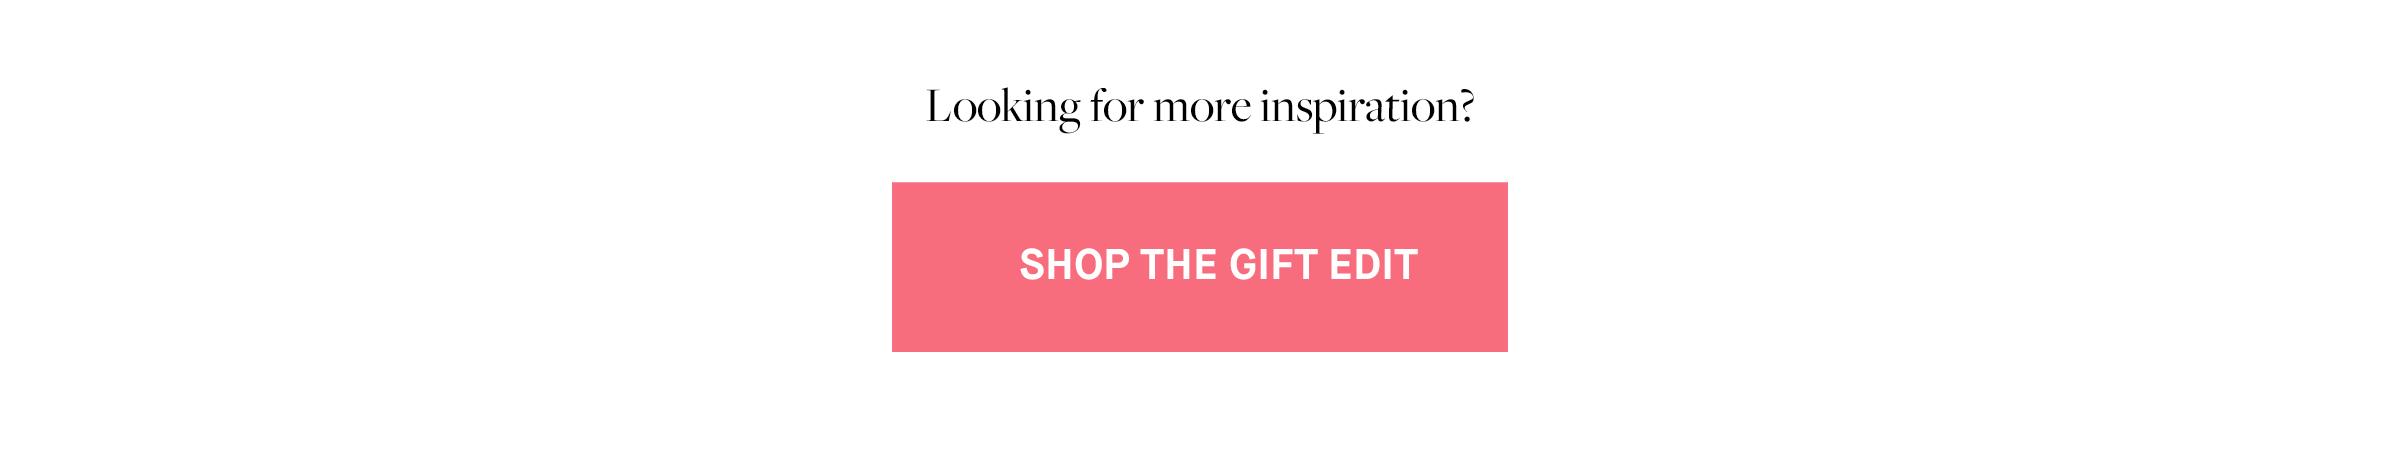 https://storage.googleapis.com/dtk-fenton-fenton/page/GiftEdit-LandingPage-GiftEditLookbook-Button_1603261523661.jpg